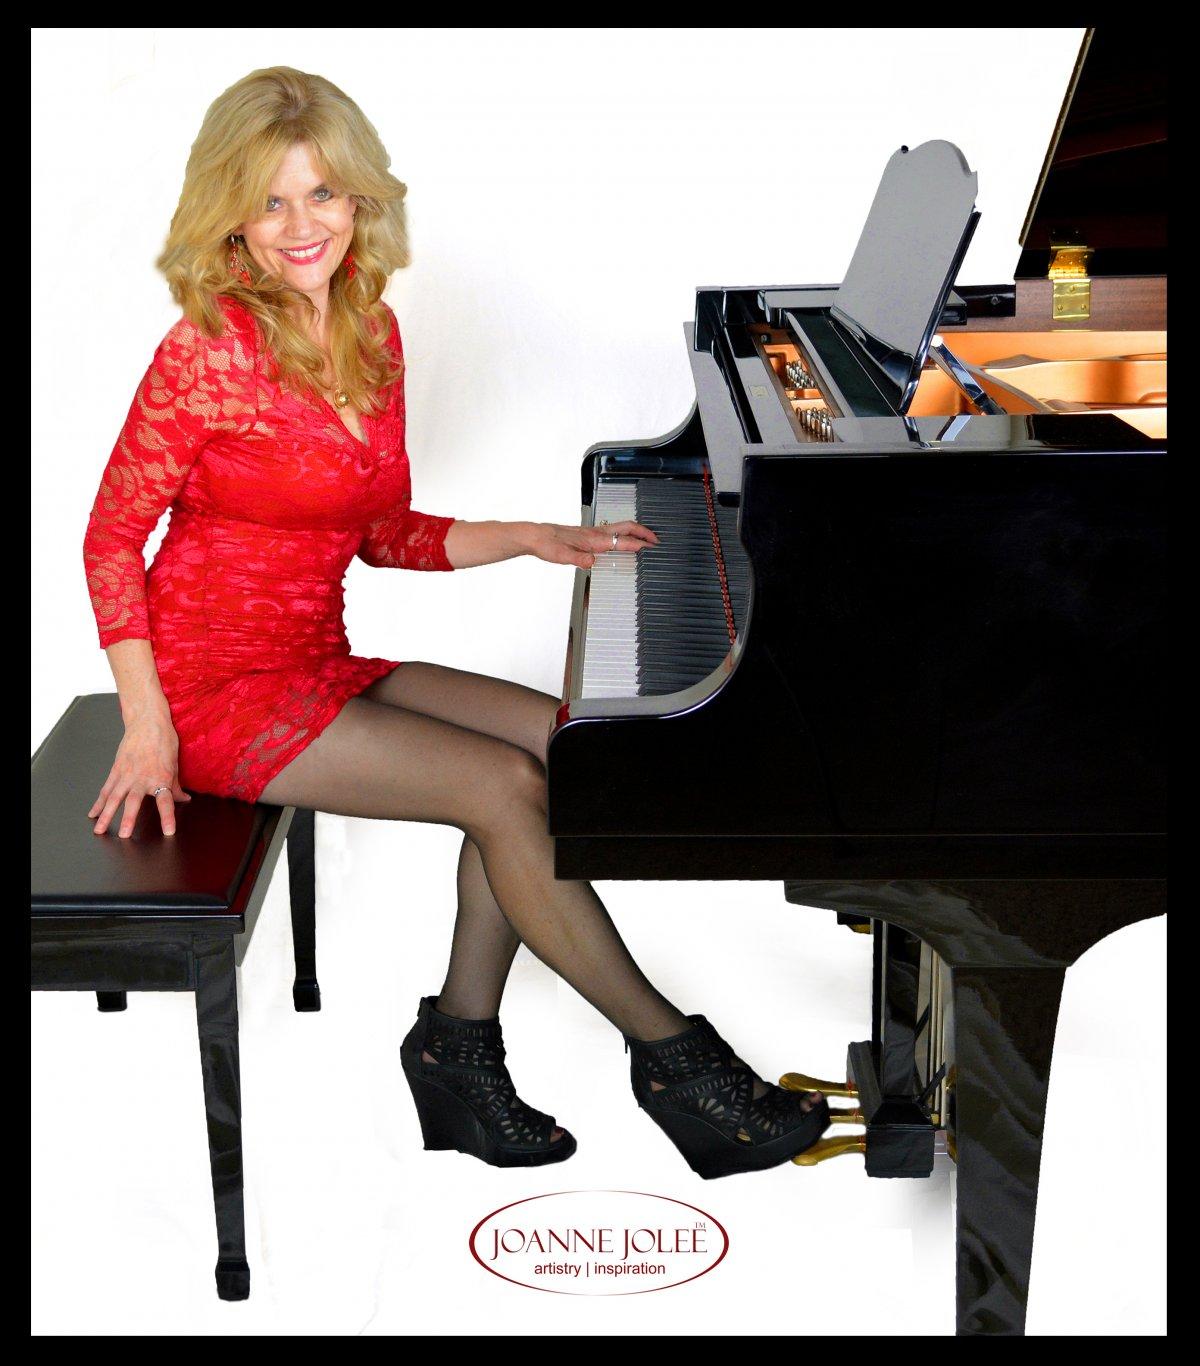 Joanne Jolee - music mentor